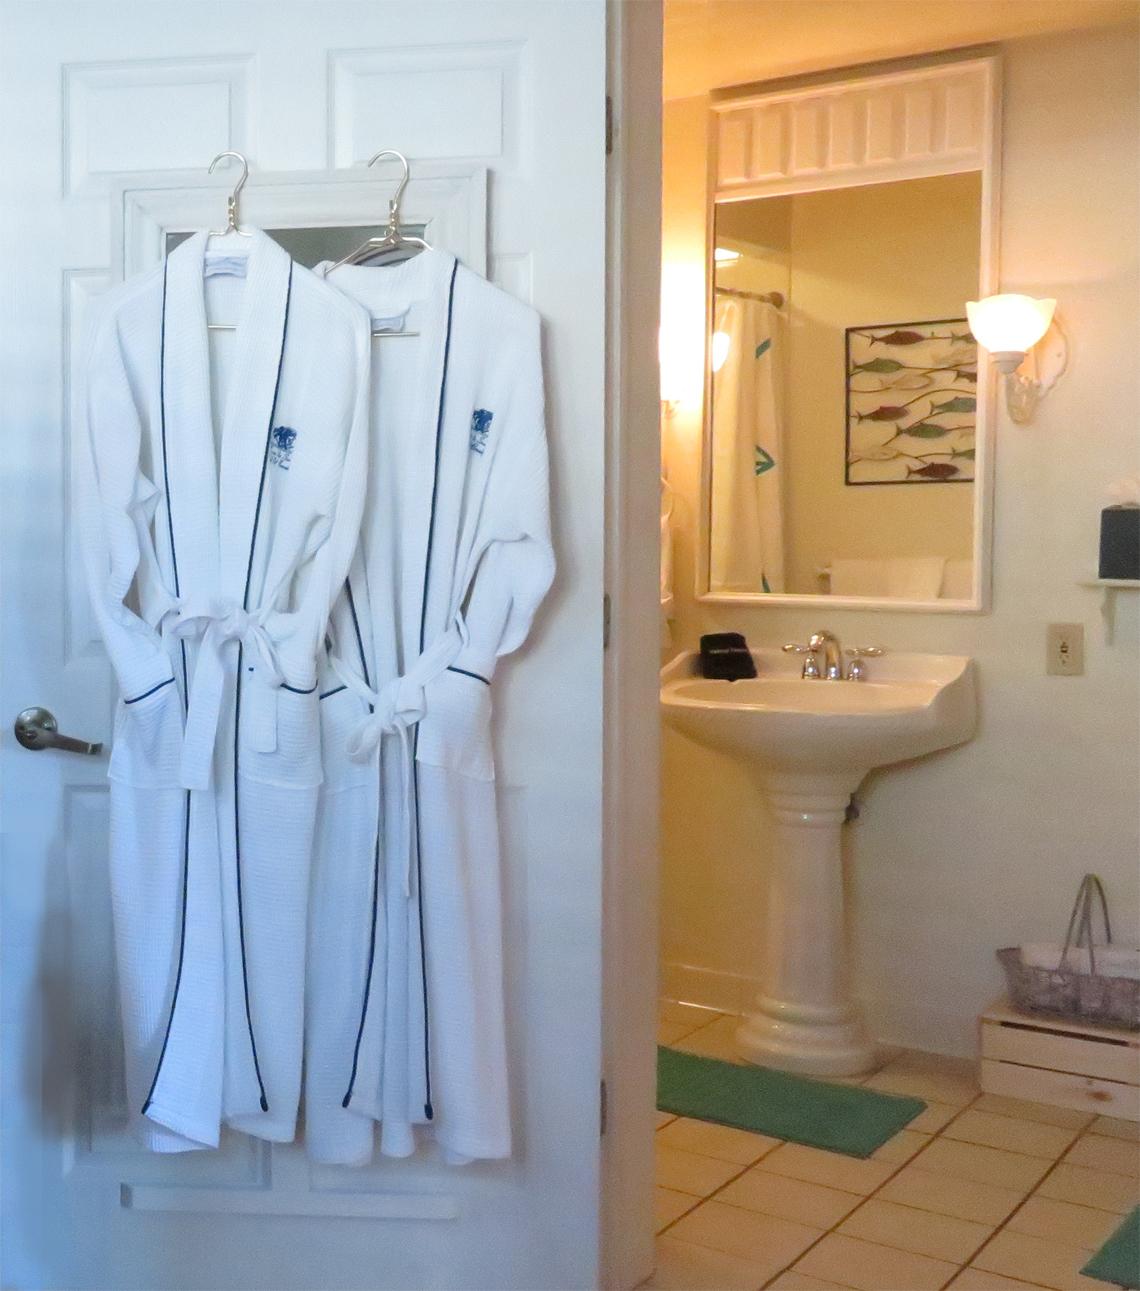 Nieves bathrobes and bathroom